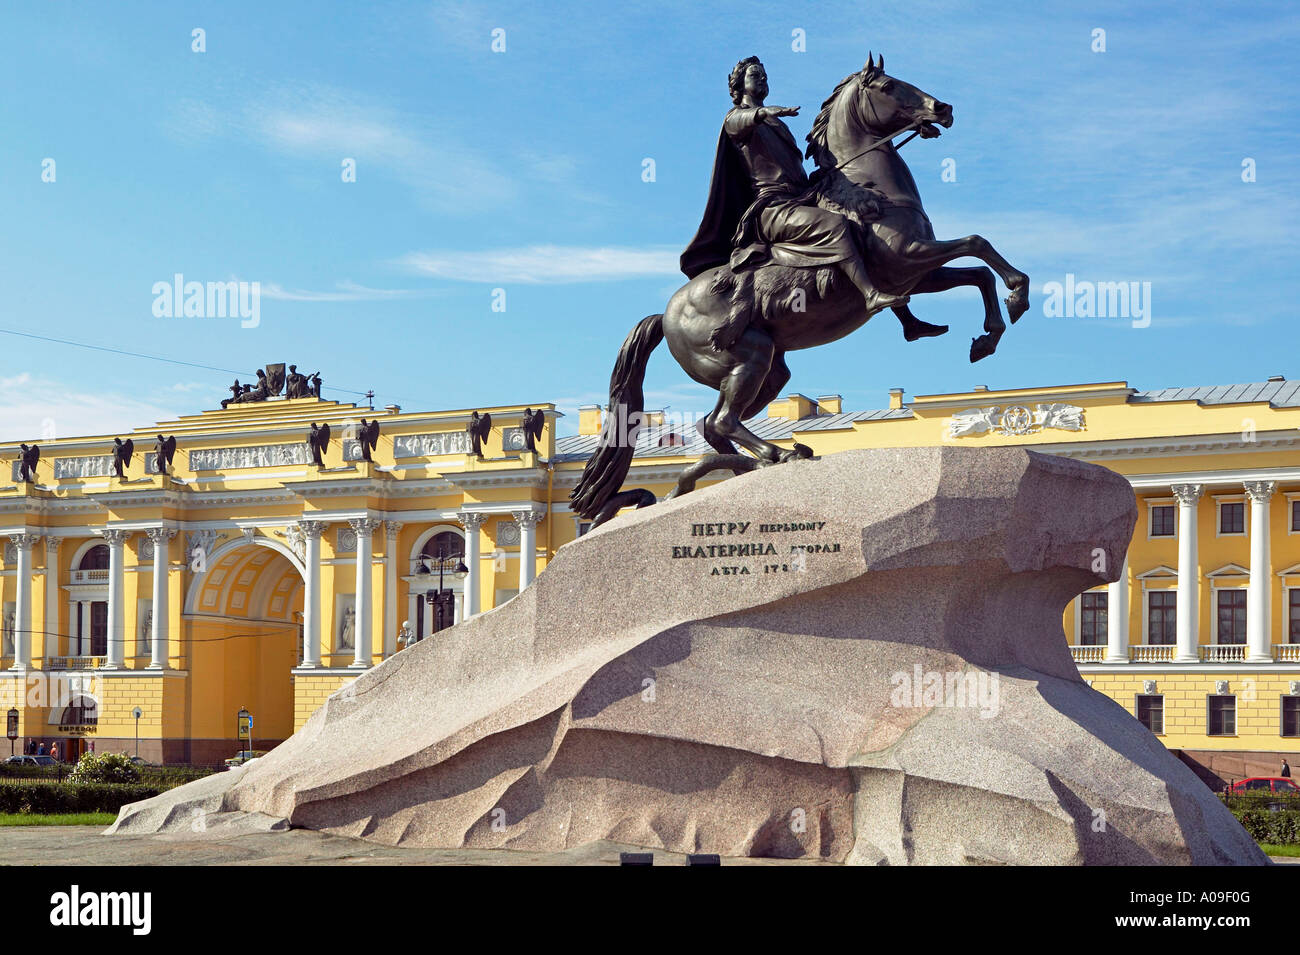 Sankt Petersburg, Eherner Reiter, Saint Petersburg horseback rider Stock Photo